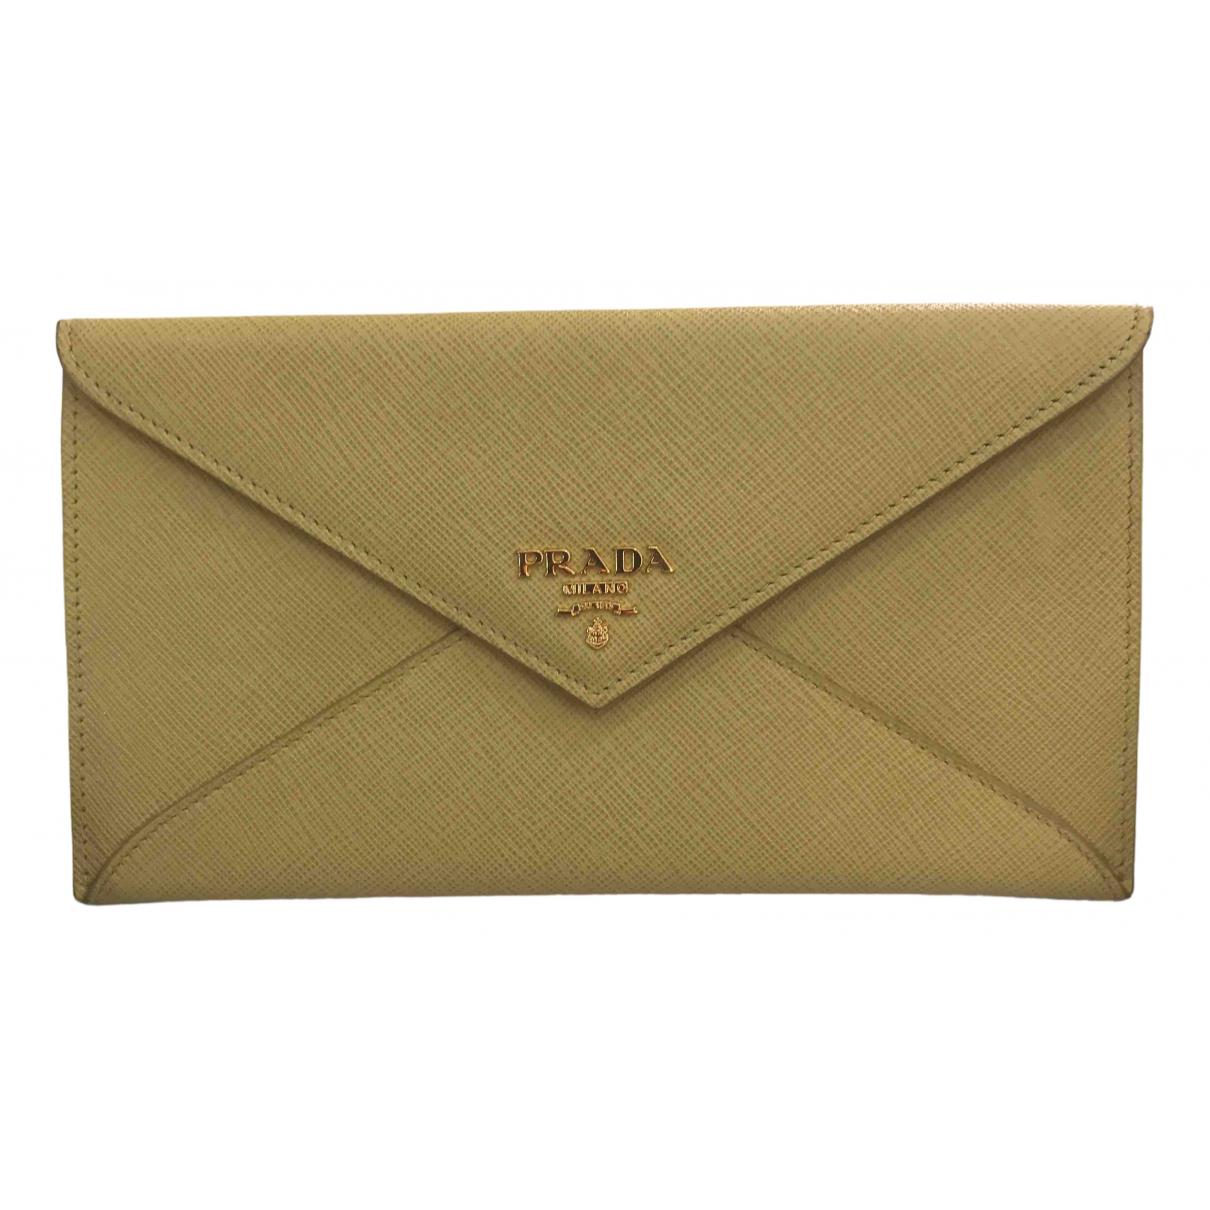 Prada \N Yellow Leather wallet for Women \N